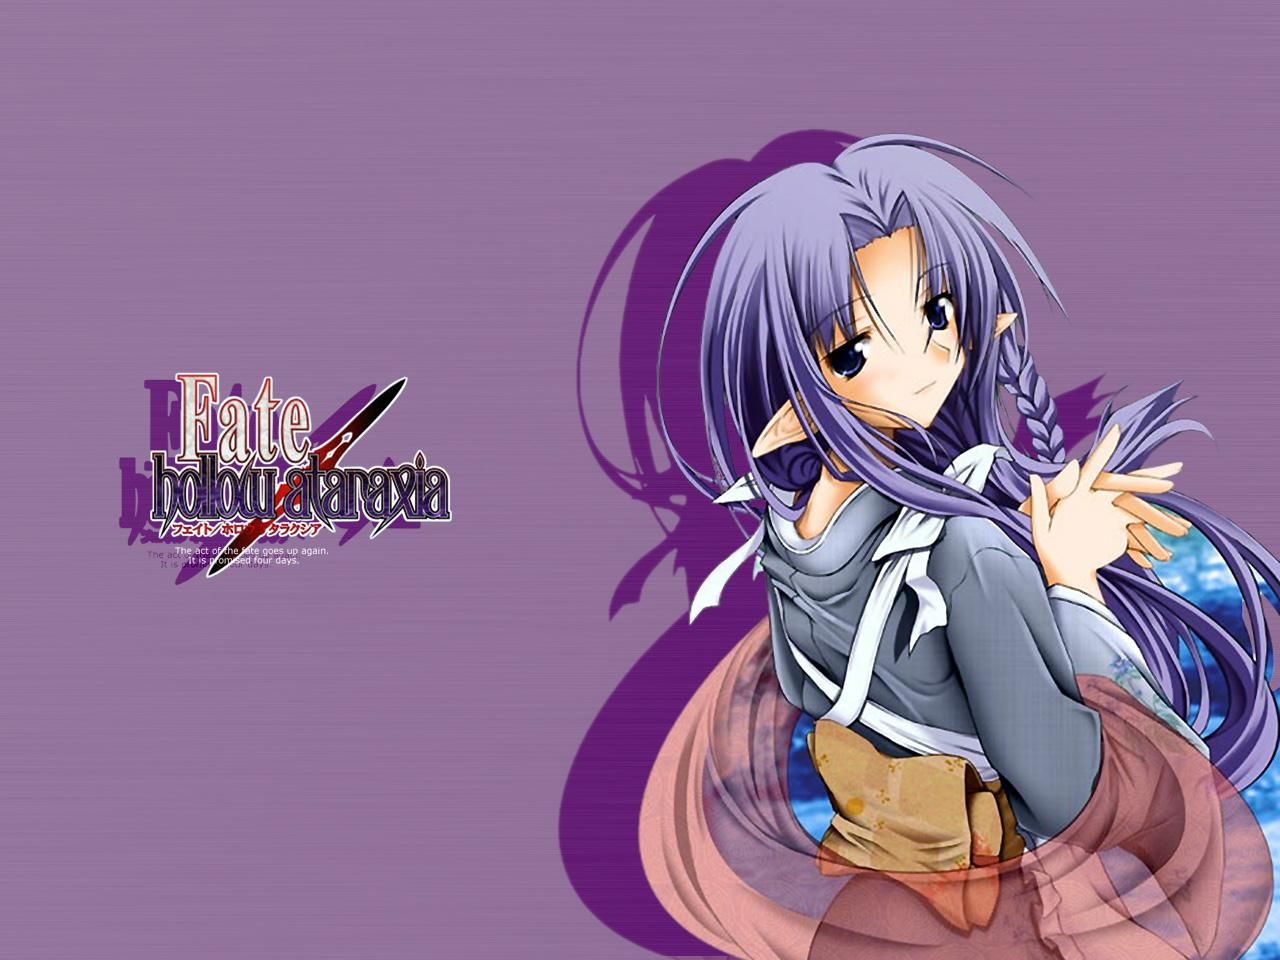 fate/hollow_ataraxia fate_(series) fate/stay_night medea_(fate) pointed_ears purple